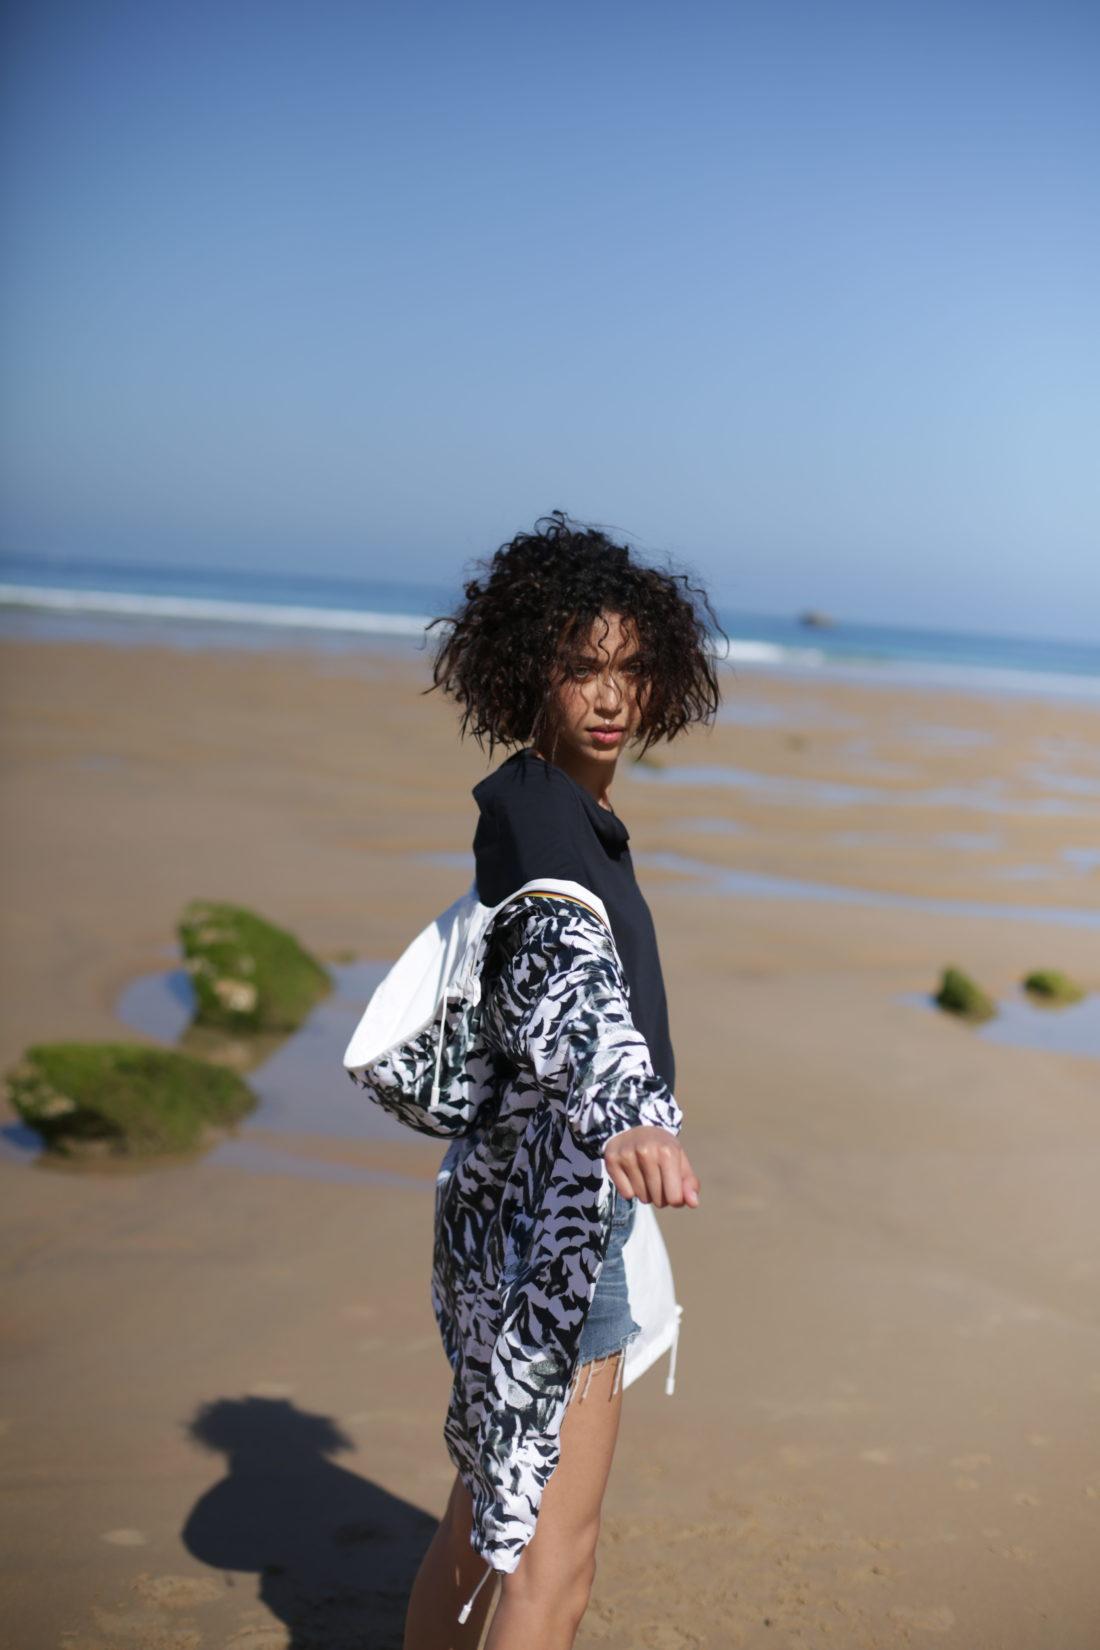 coiffure studio cheveux boucles effet beachhair plage biarritz